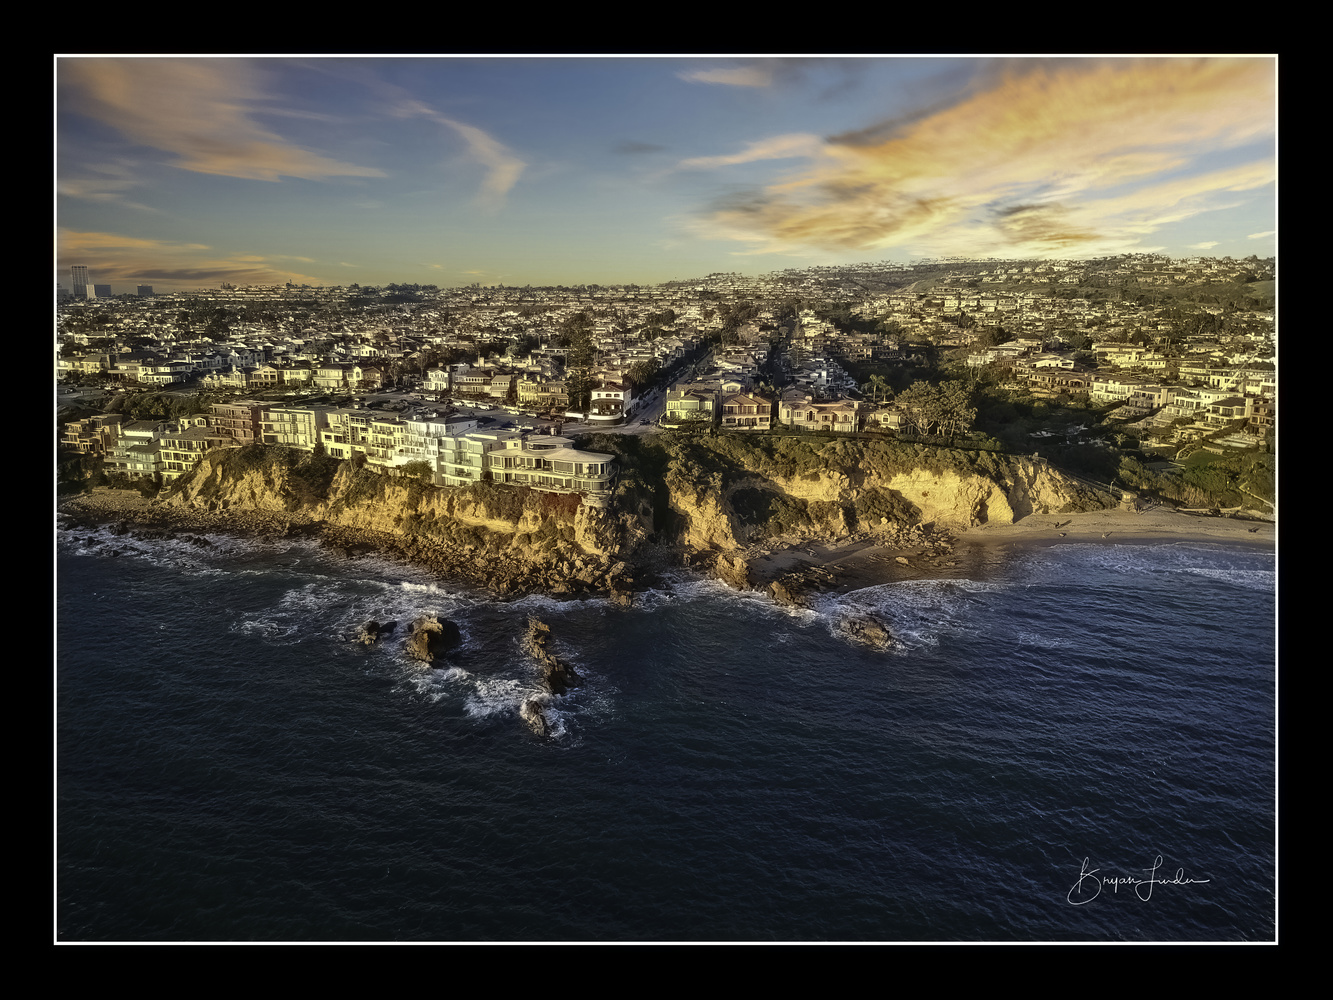 Corona Del Mar by drone by Bryan Linden